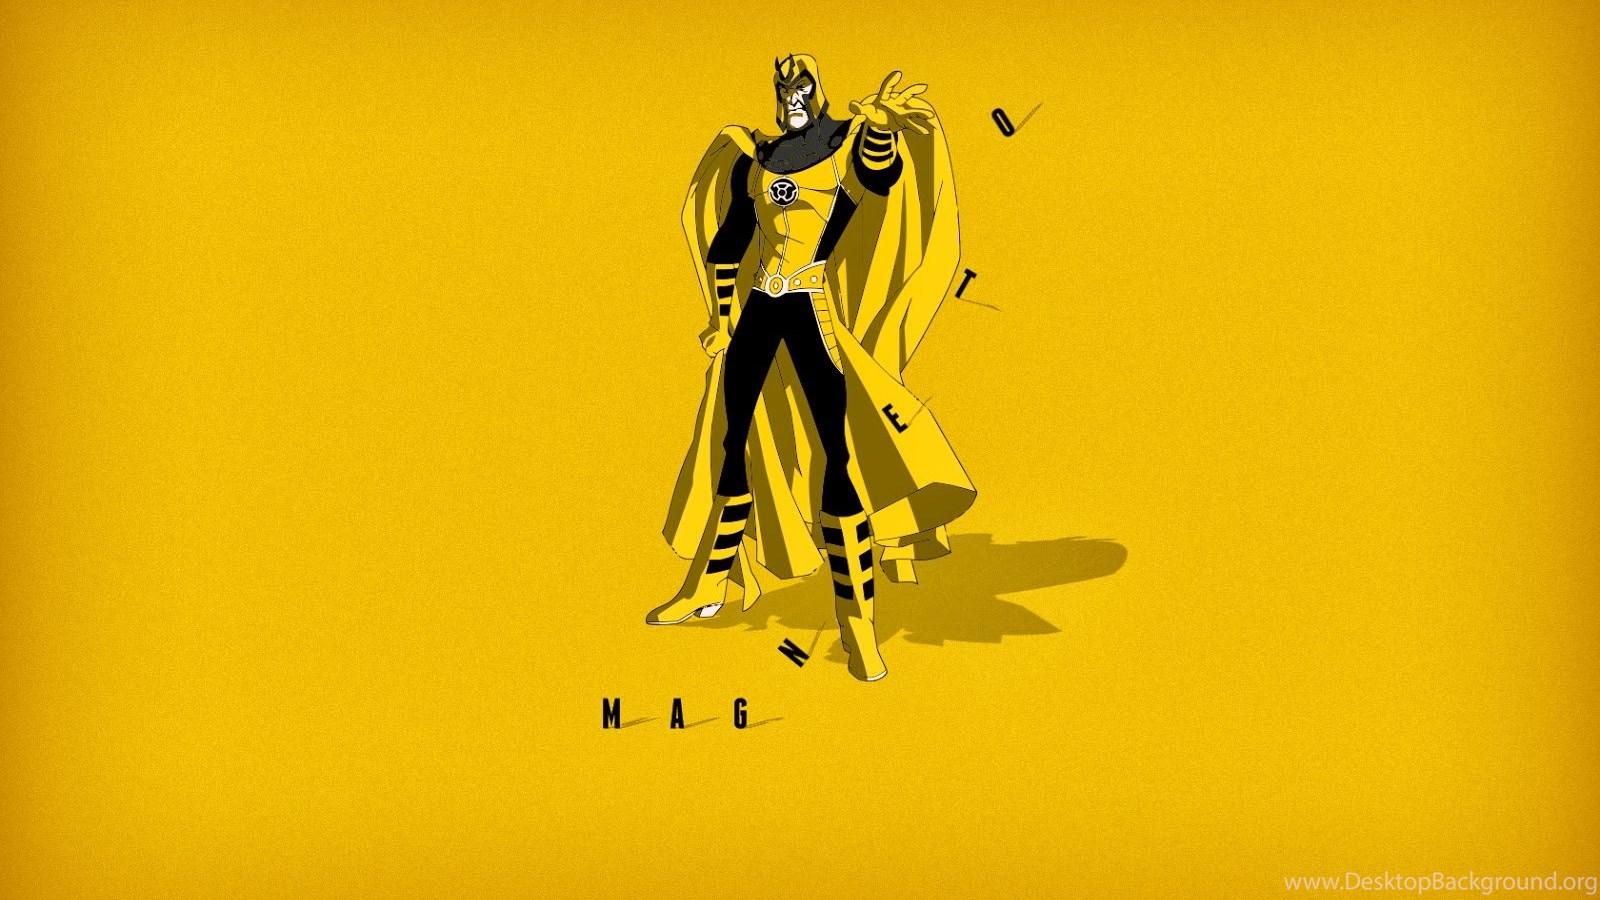 Super Heroes Wallpaper Magneto X Man Hd Wallpapers Super Villain Desktop Background